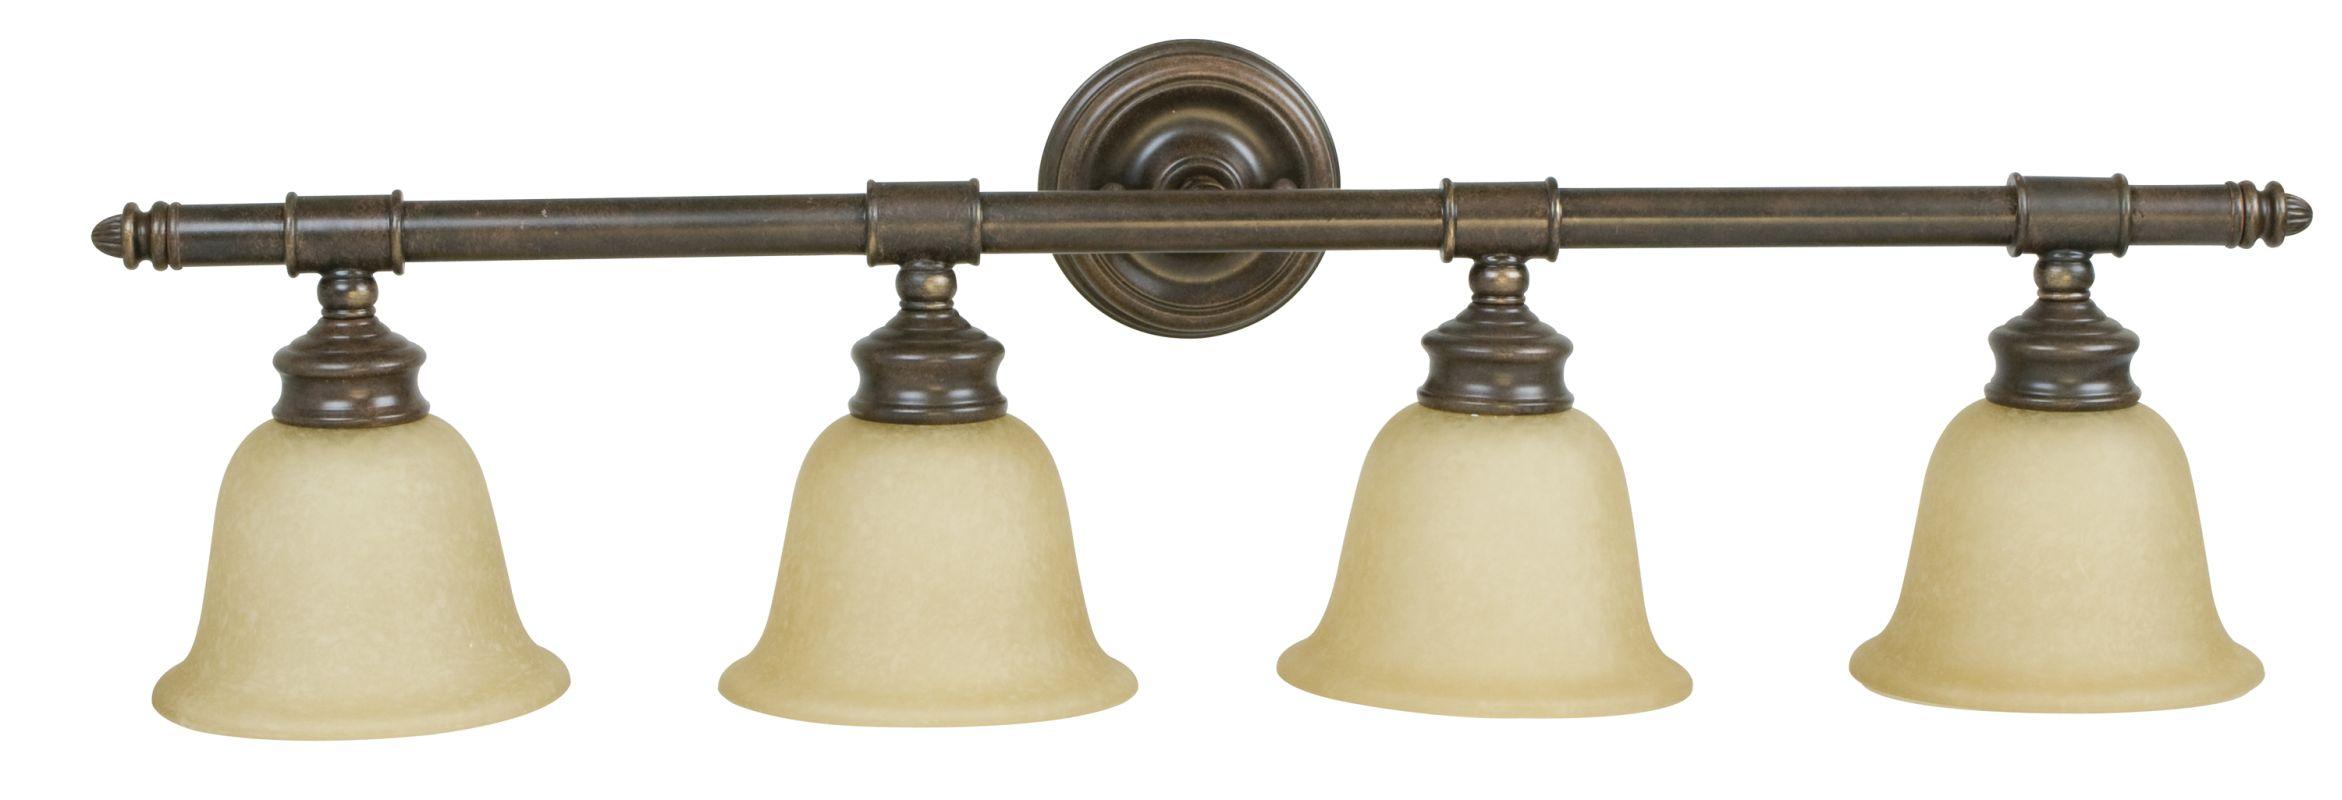 Craftmade 10635 Fresno 4 Light Bathroom Vanity Light Aged Bronze Sale $158.00 ITEM#: 1023821 MODEL# :10635AG4 UPC#: 647881035983 :